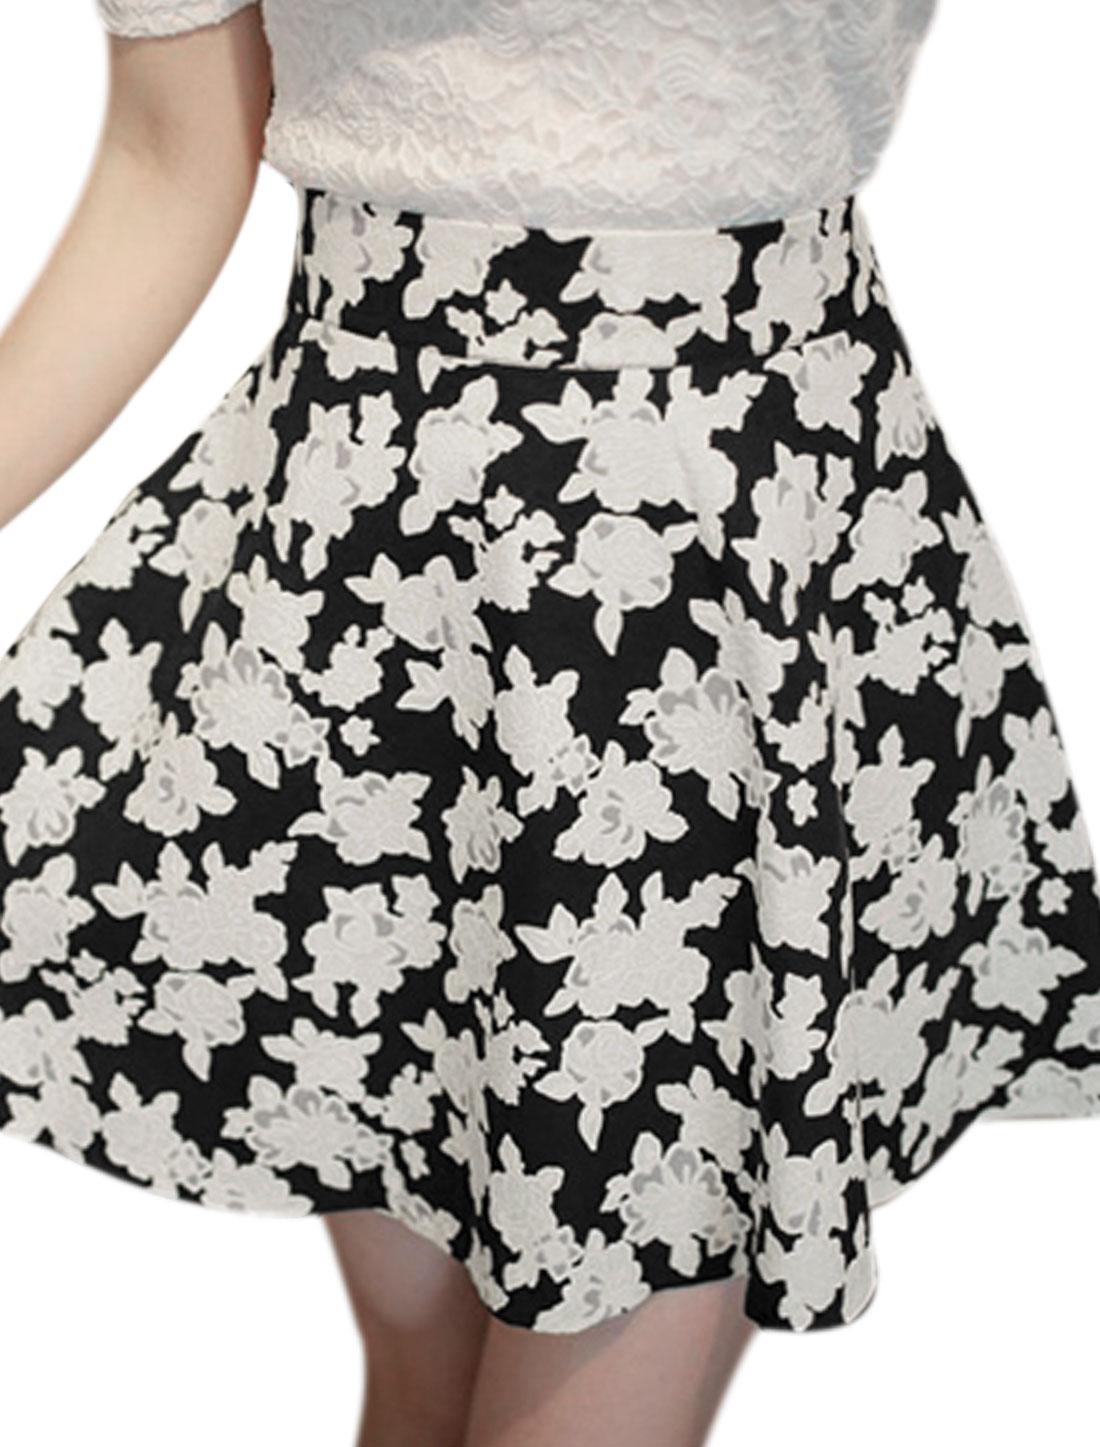 Lady's Floral Prints Lined Hidden Zipper Side High Waist Mini Skirt Black White S